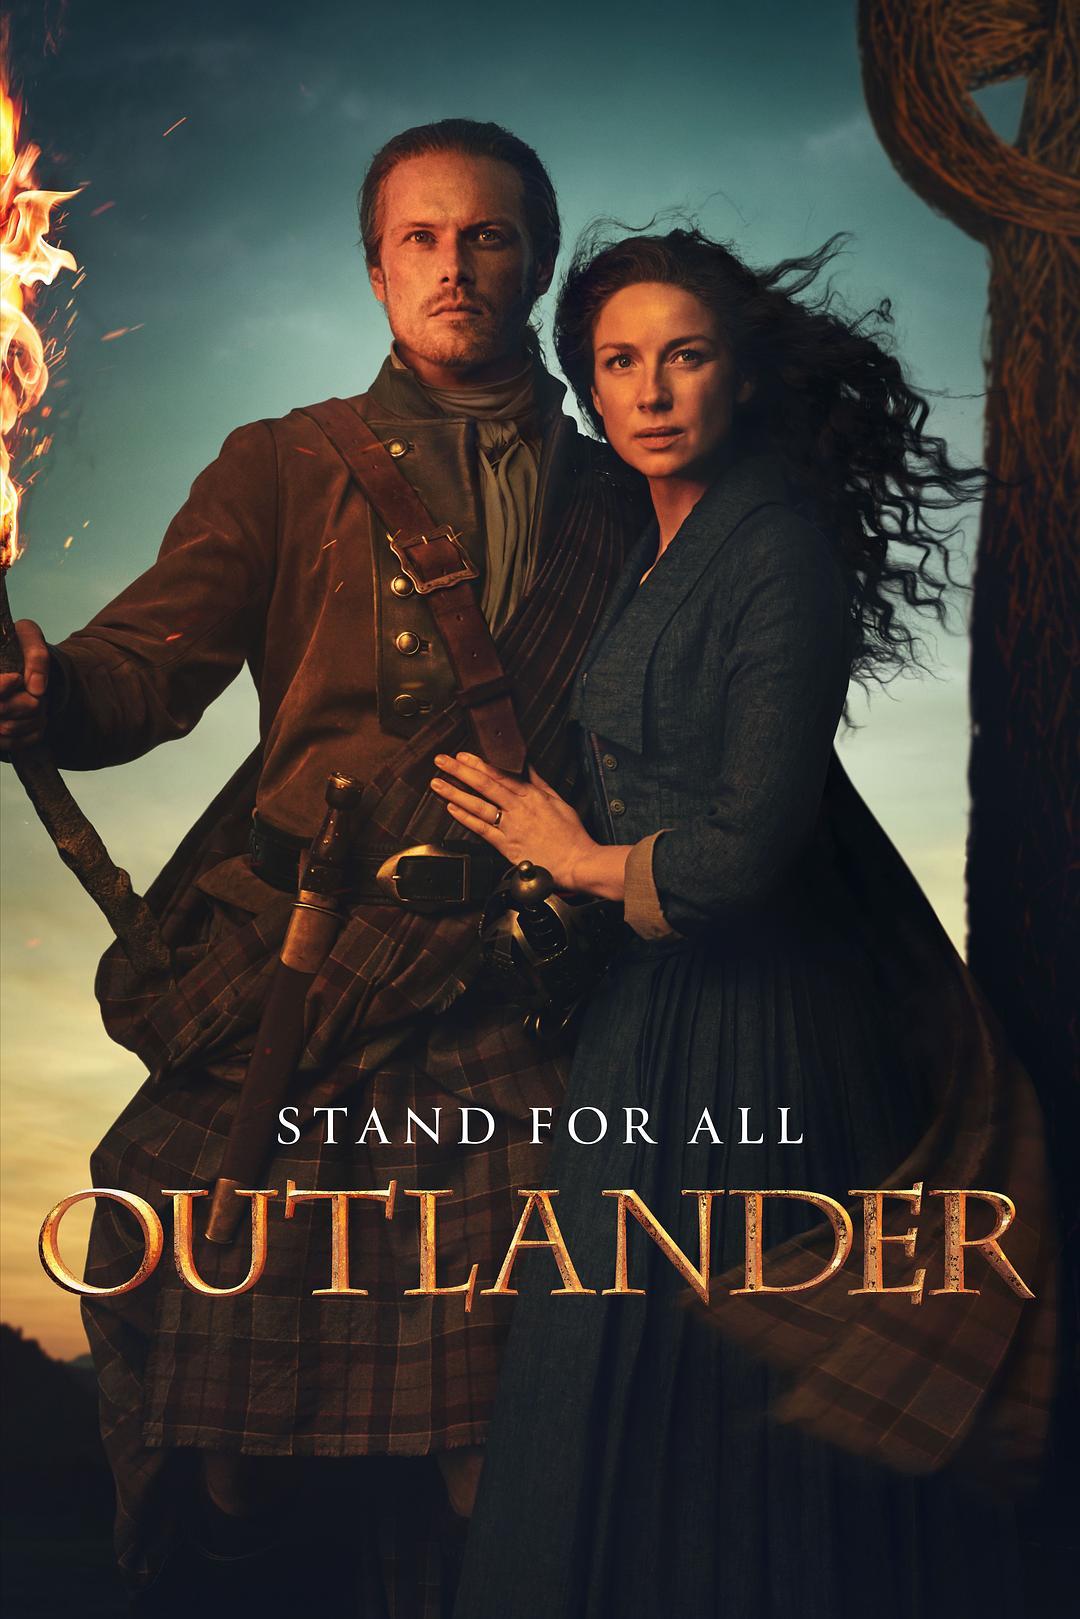 古战场传奇 第五季 Outlander Season 5